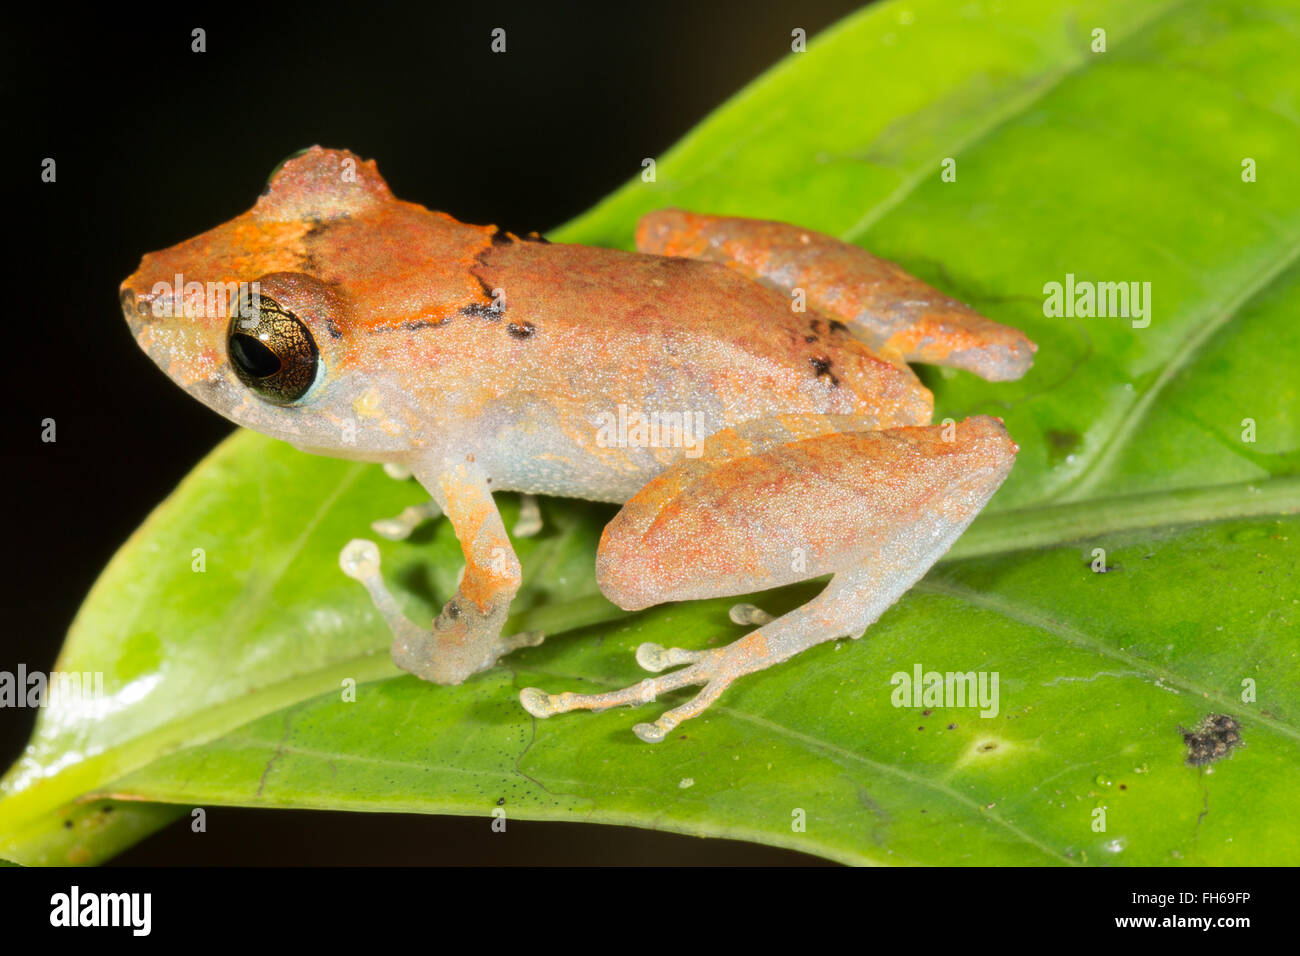 Kichwa Rain Frog (Pristimatis kichwarum) in the rainforest, Pastaza province, Ecuador Stock Photo